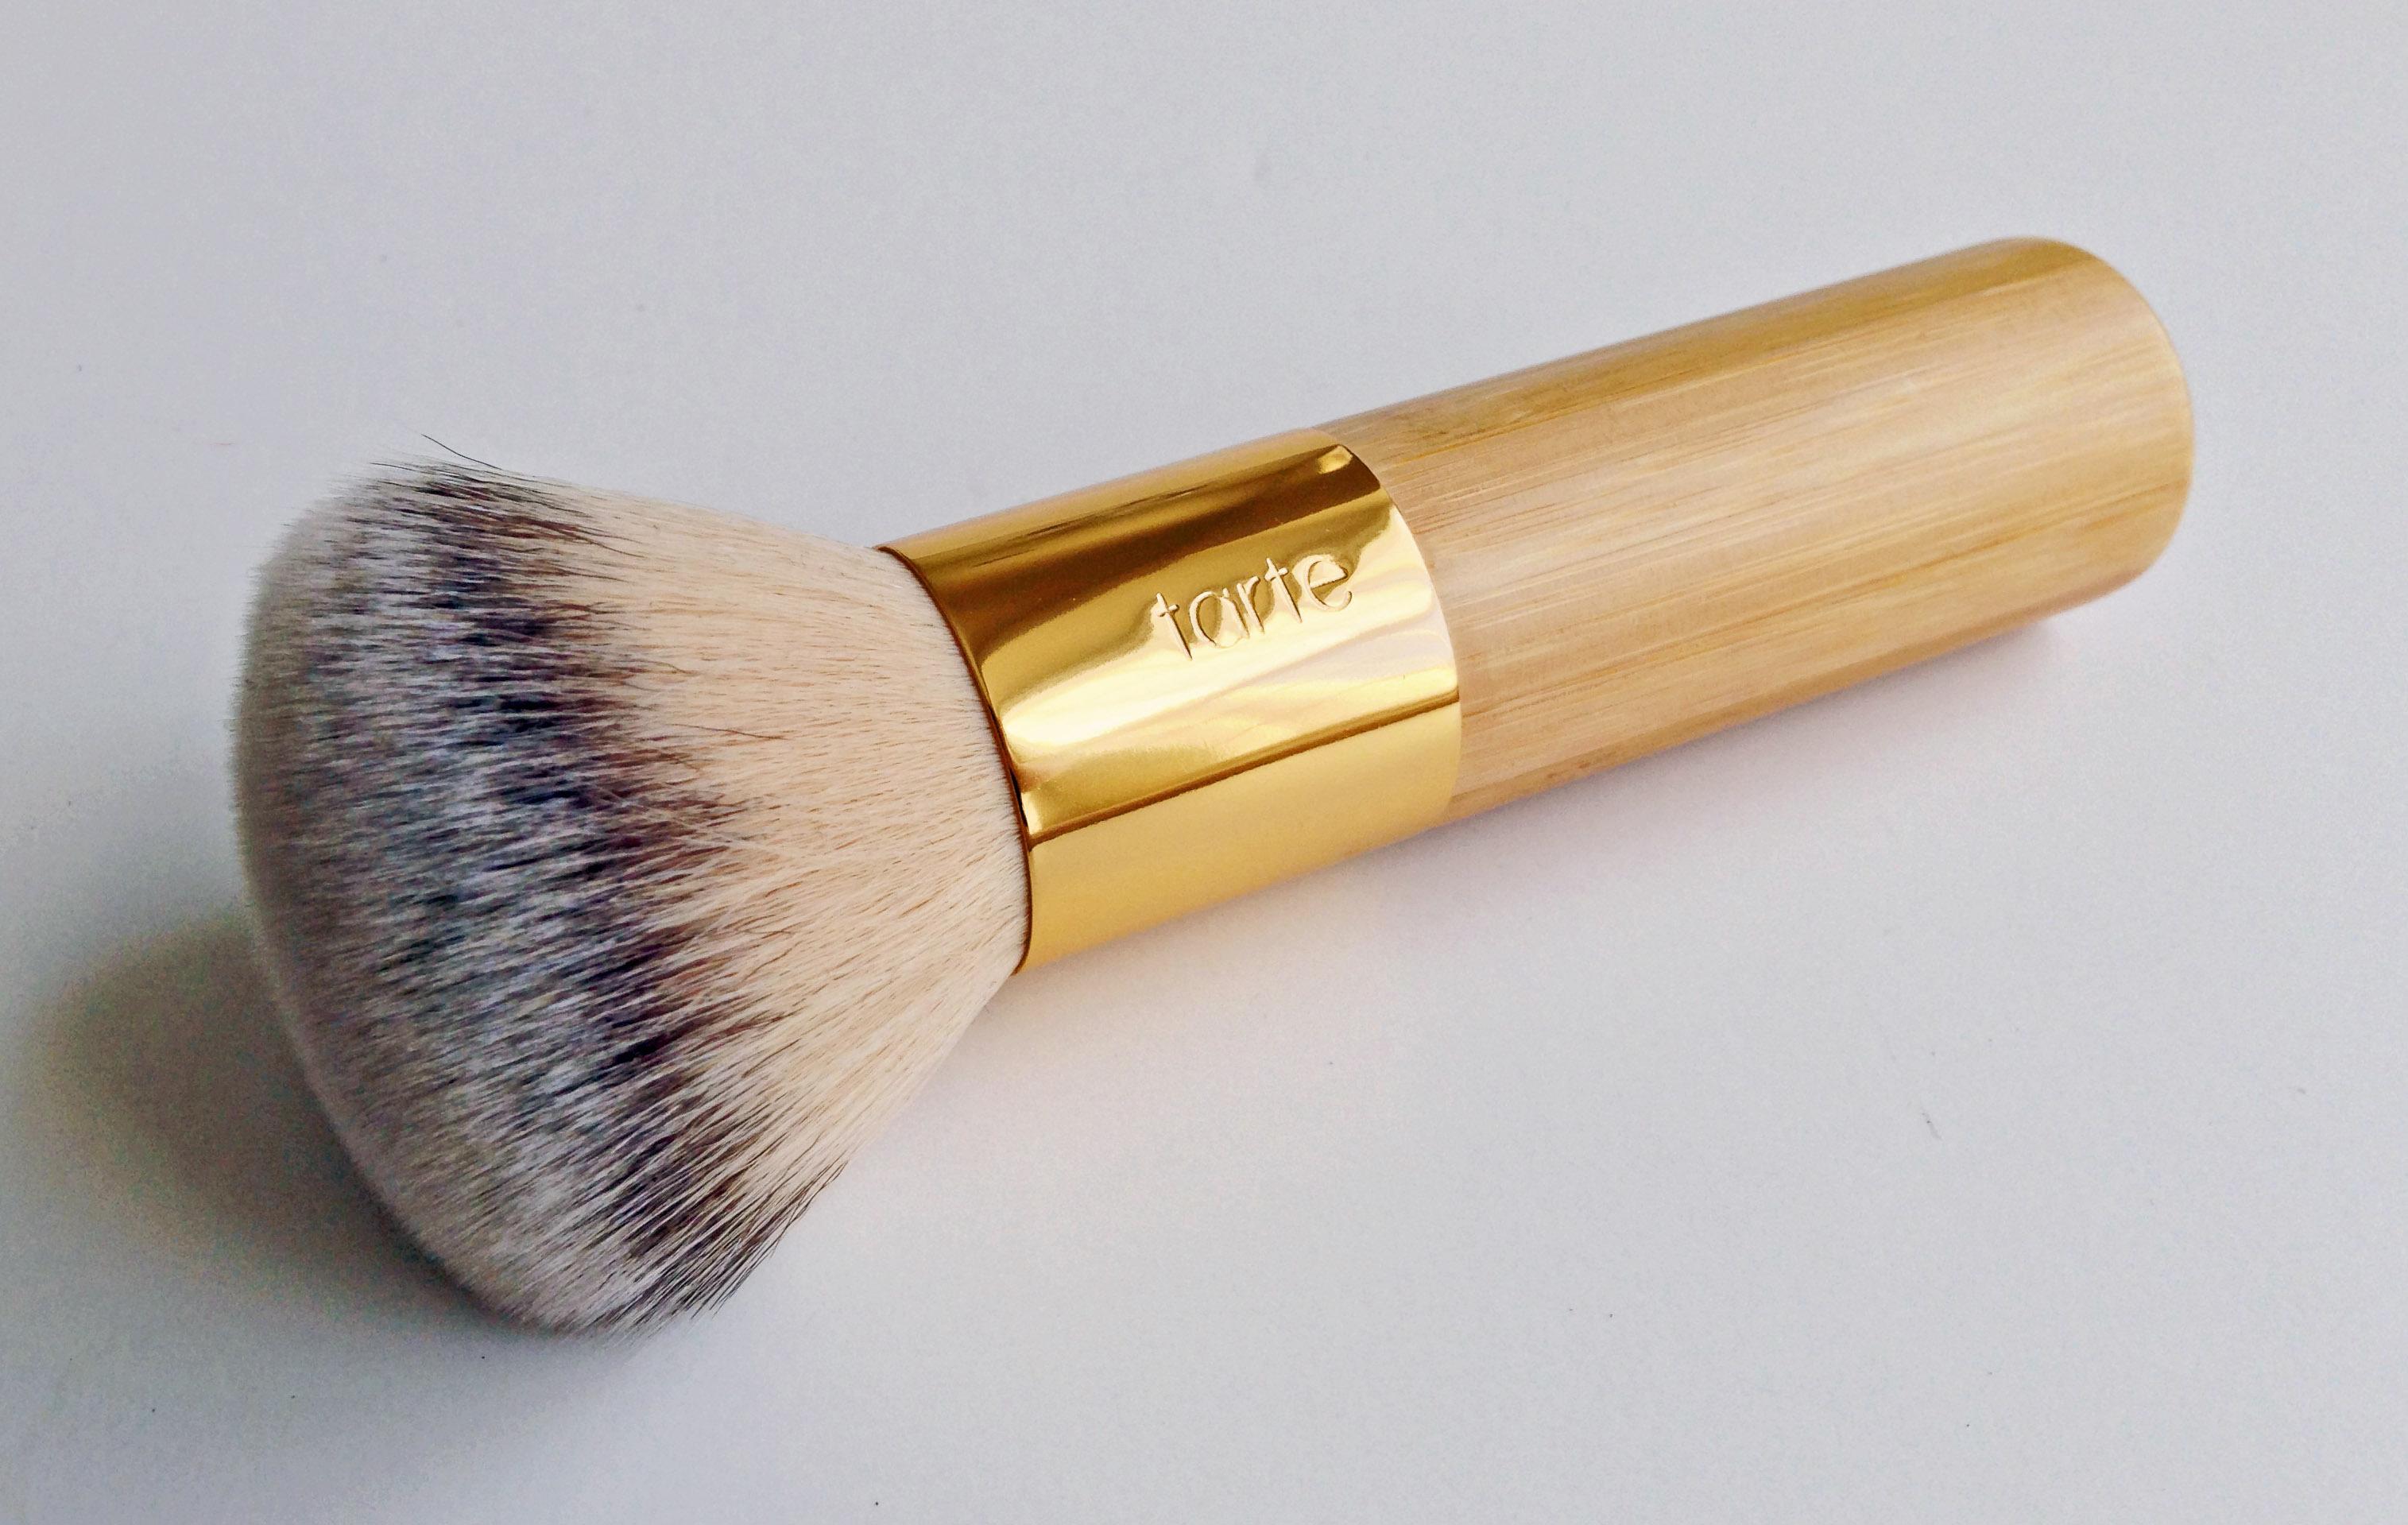 The Buffer Airbrush Finish Bamboo Foundation Brush by Tarte #15